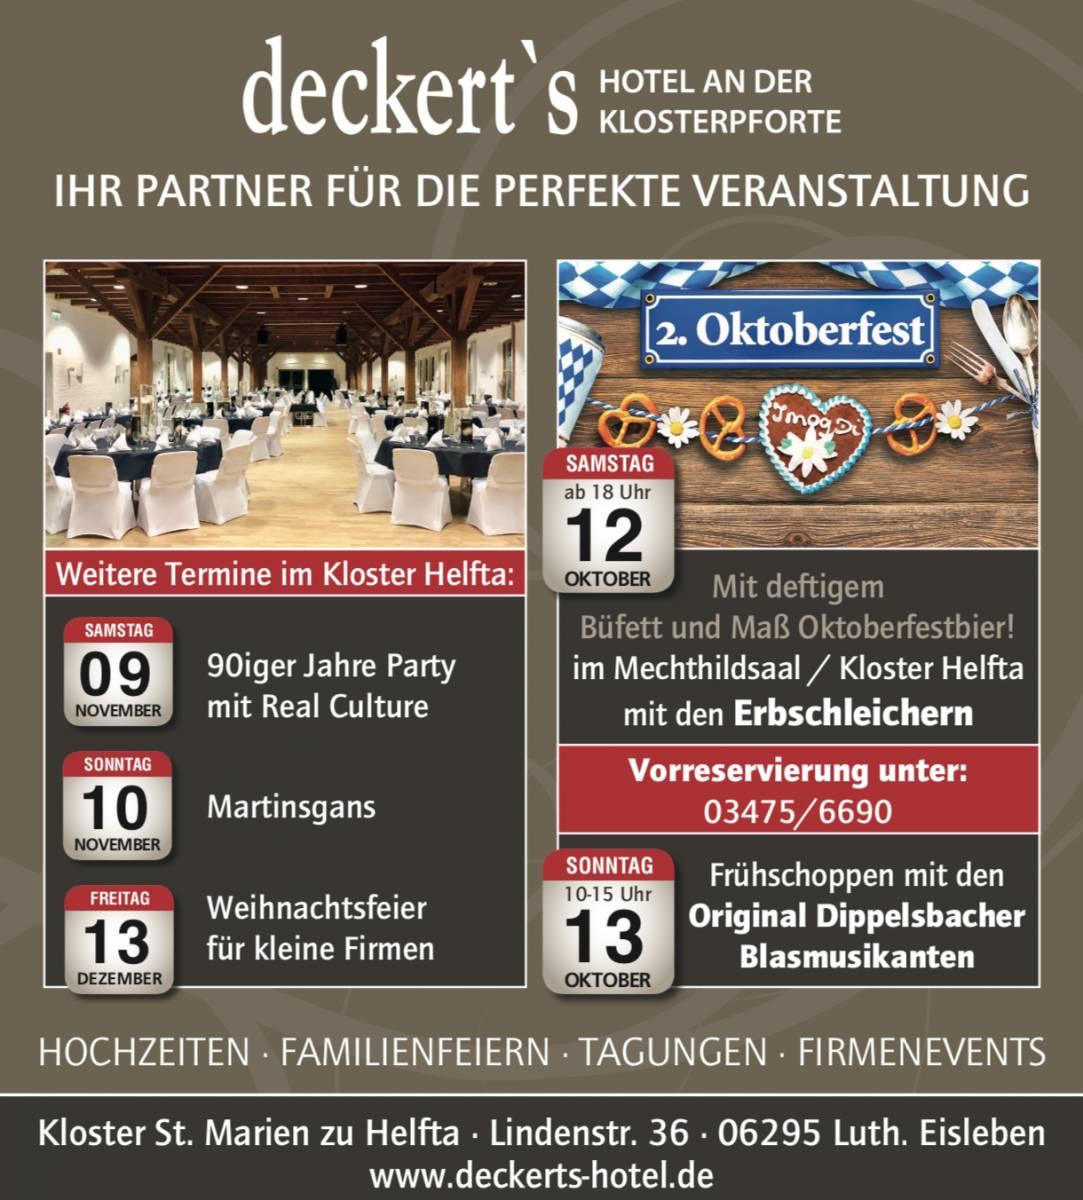 Frühschoppen mit den Original Dippelsbacher Blasmusikanten